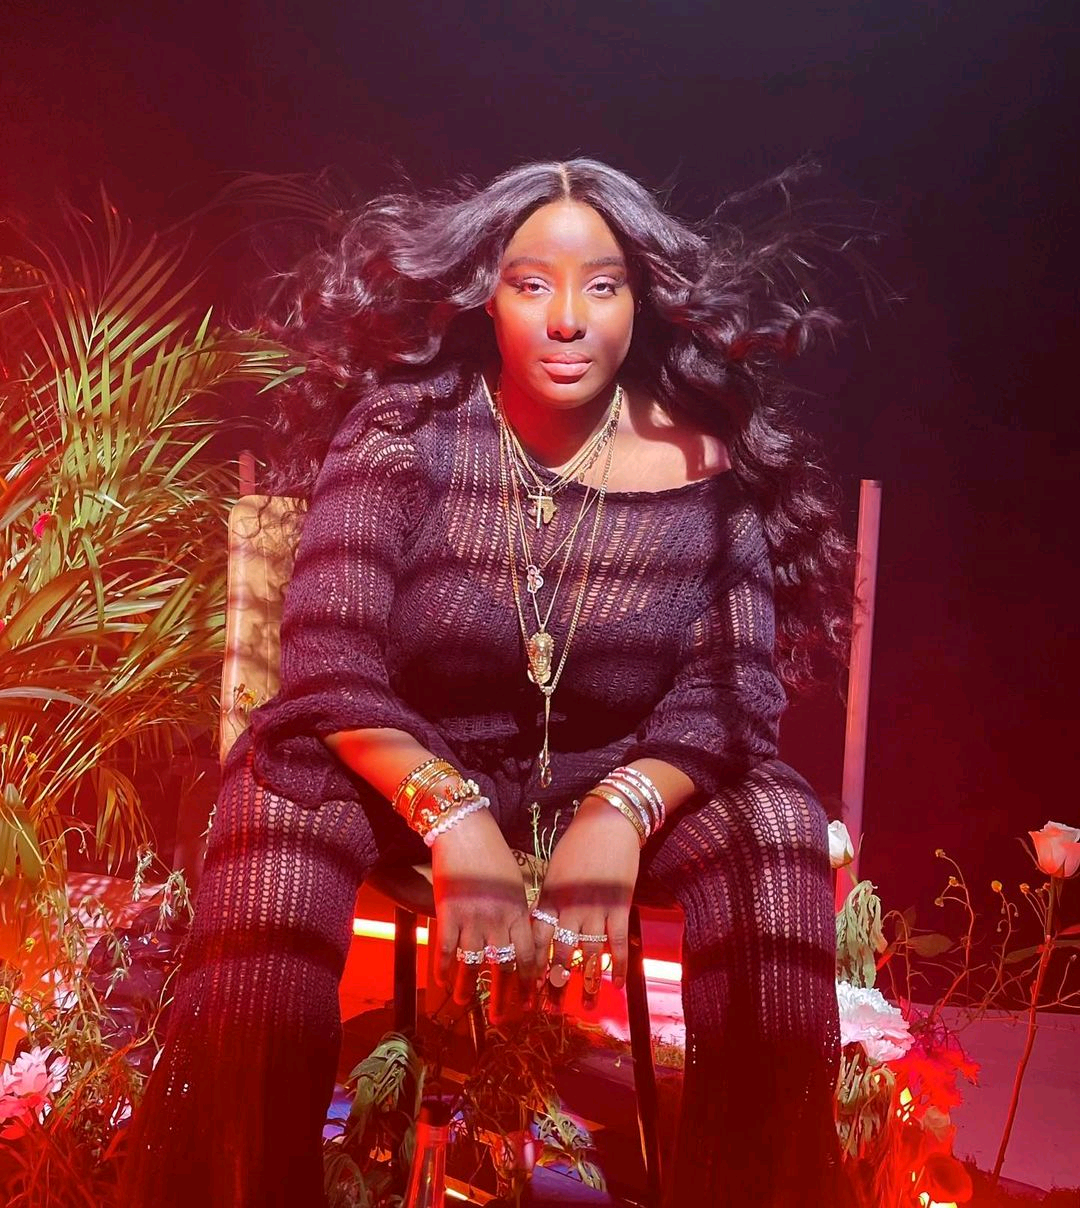 Why I've Been Absent From Social Media - Singer Tolani Otedola